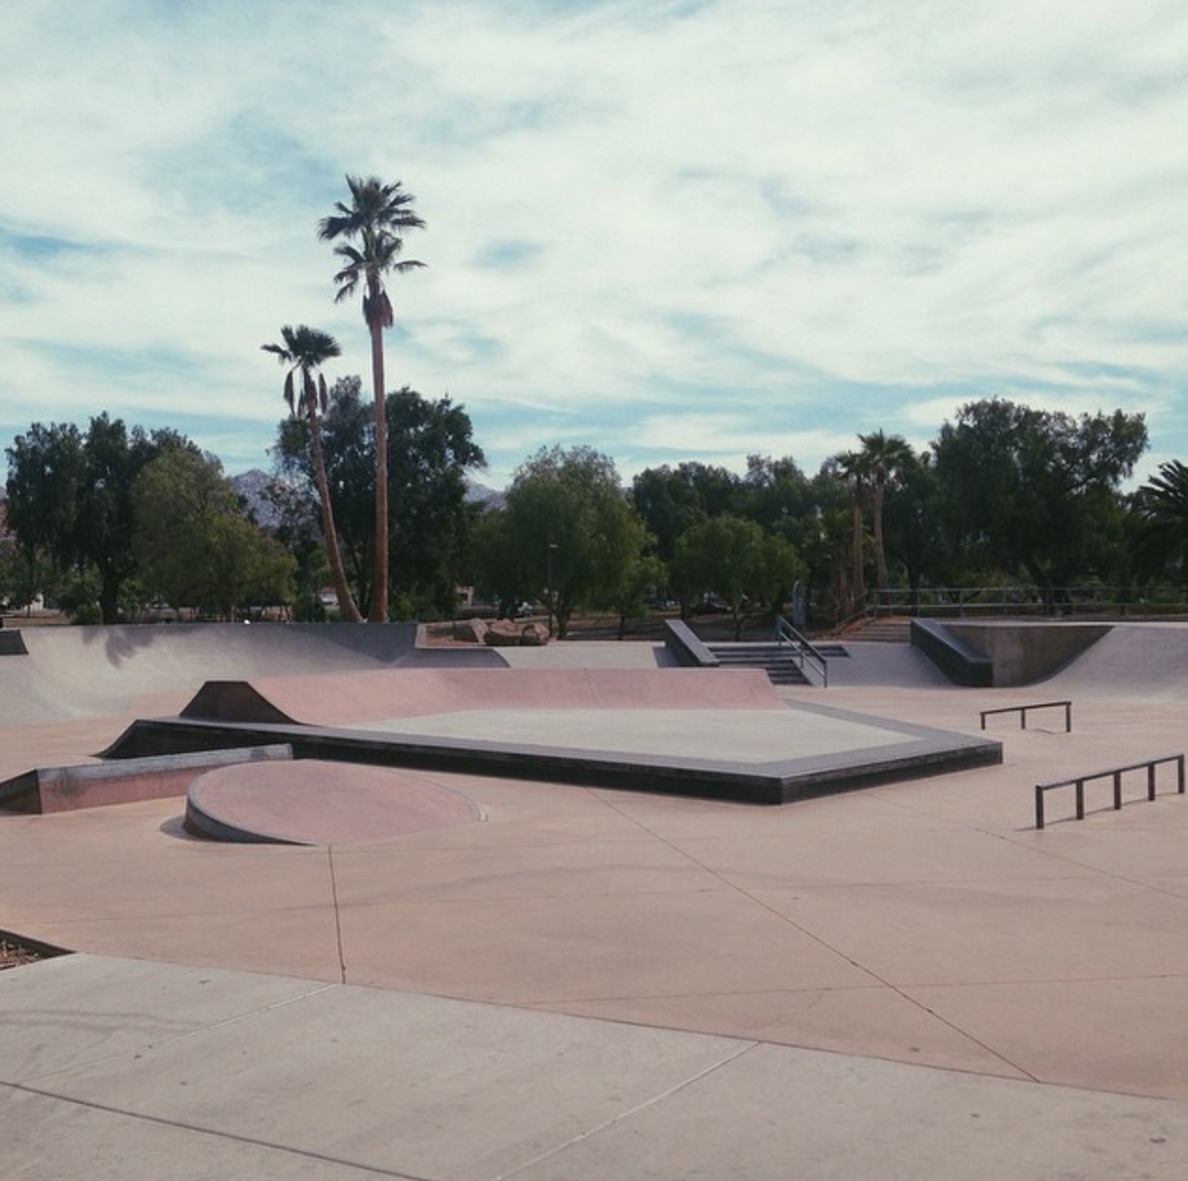 lindo lake skatepark, lakeside, california